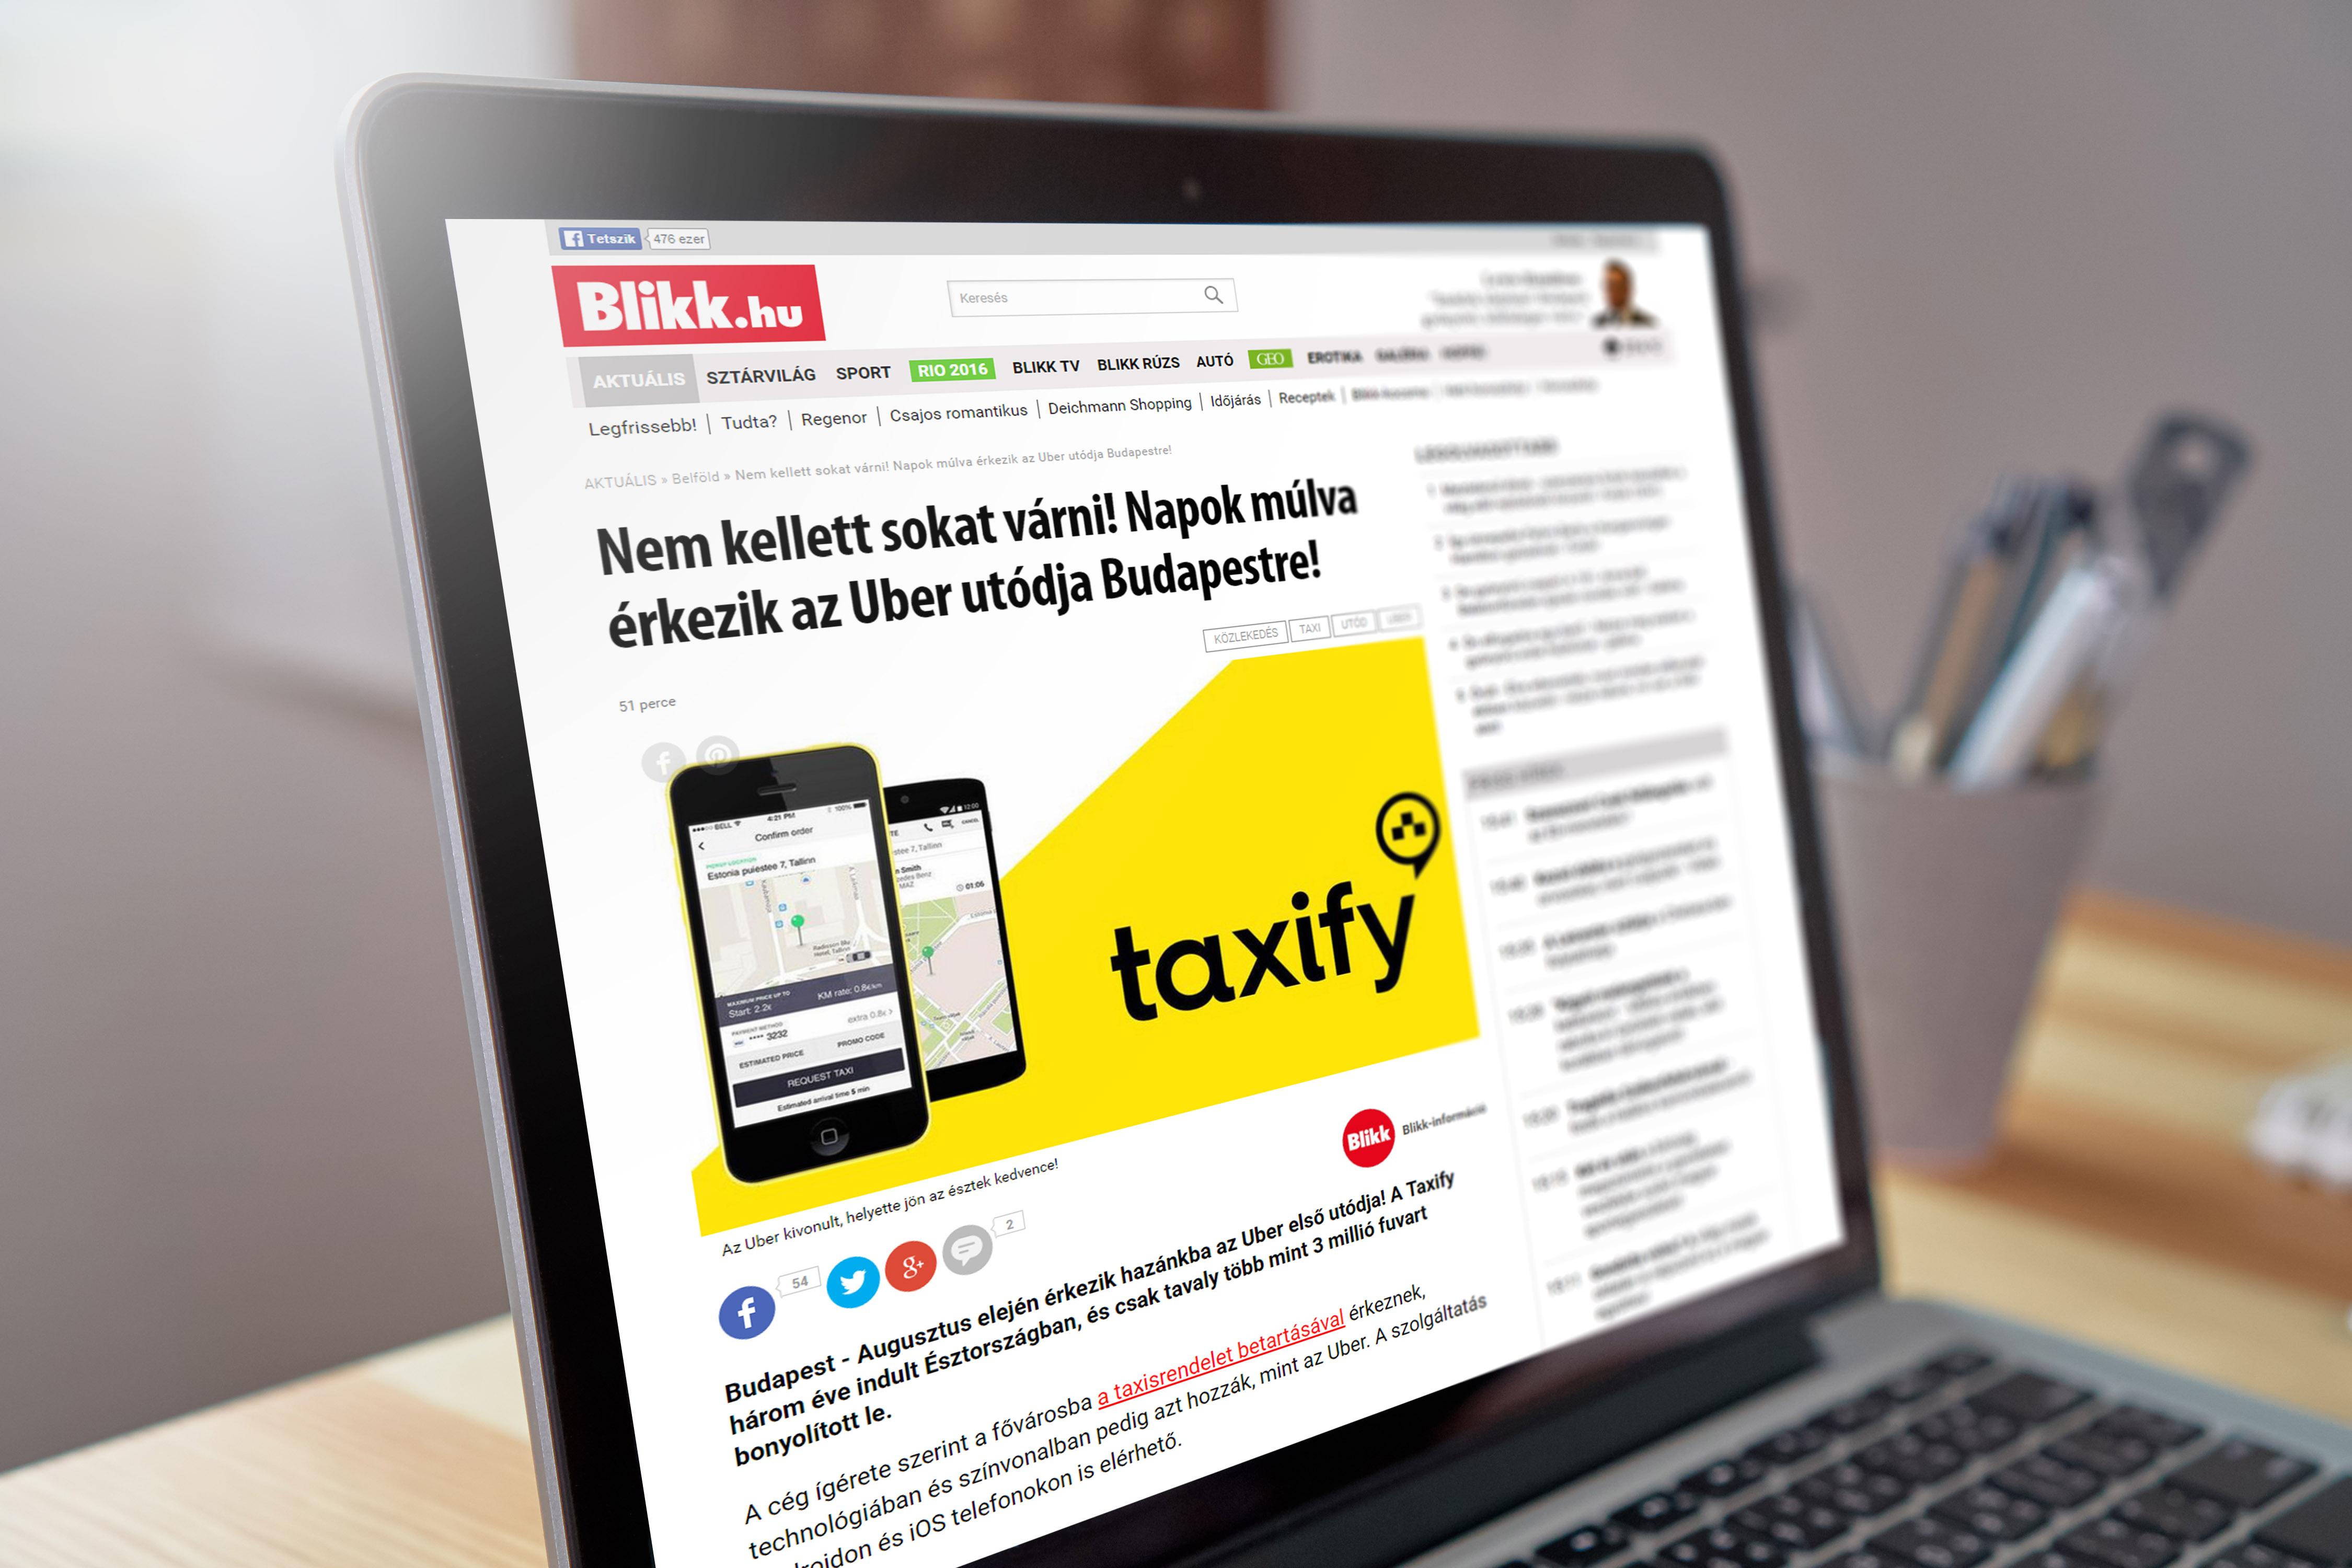 taxify_termek_bevezetesi_kampany